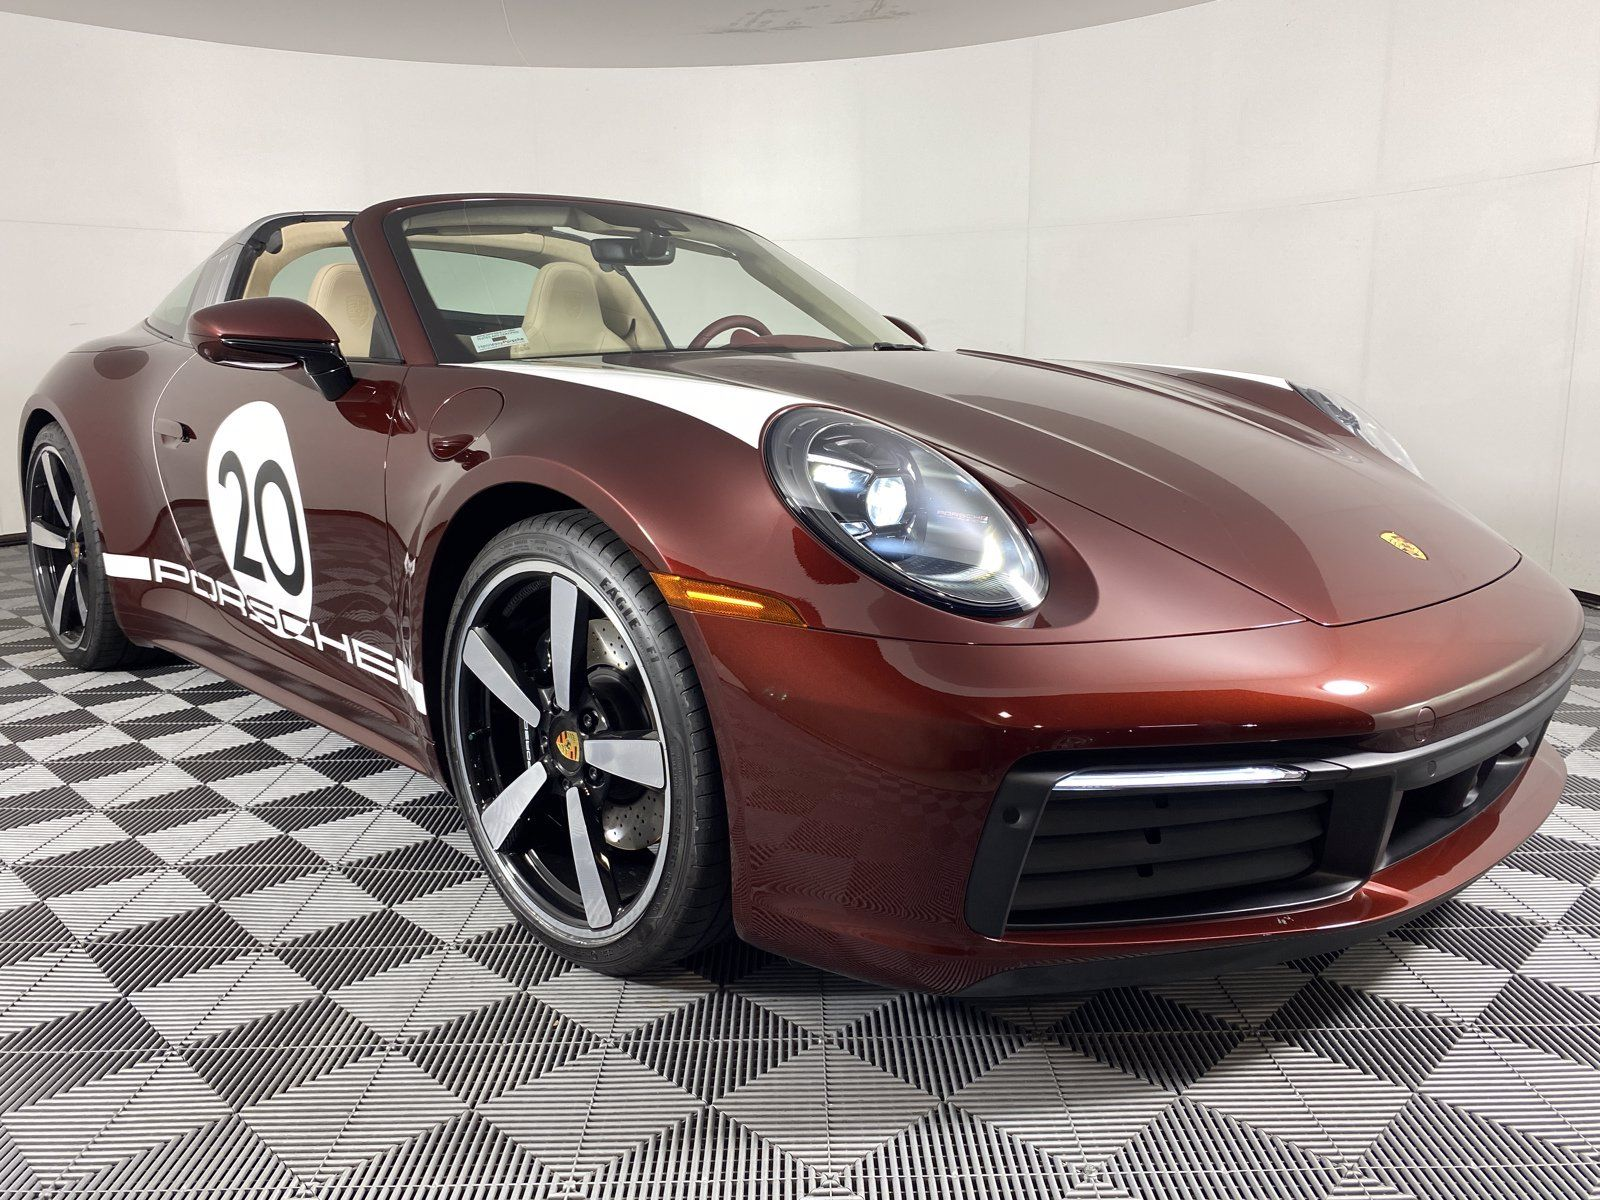 2021 Porsche 911 Targa 4S Heritage Design Edition – 4